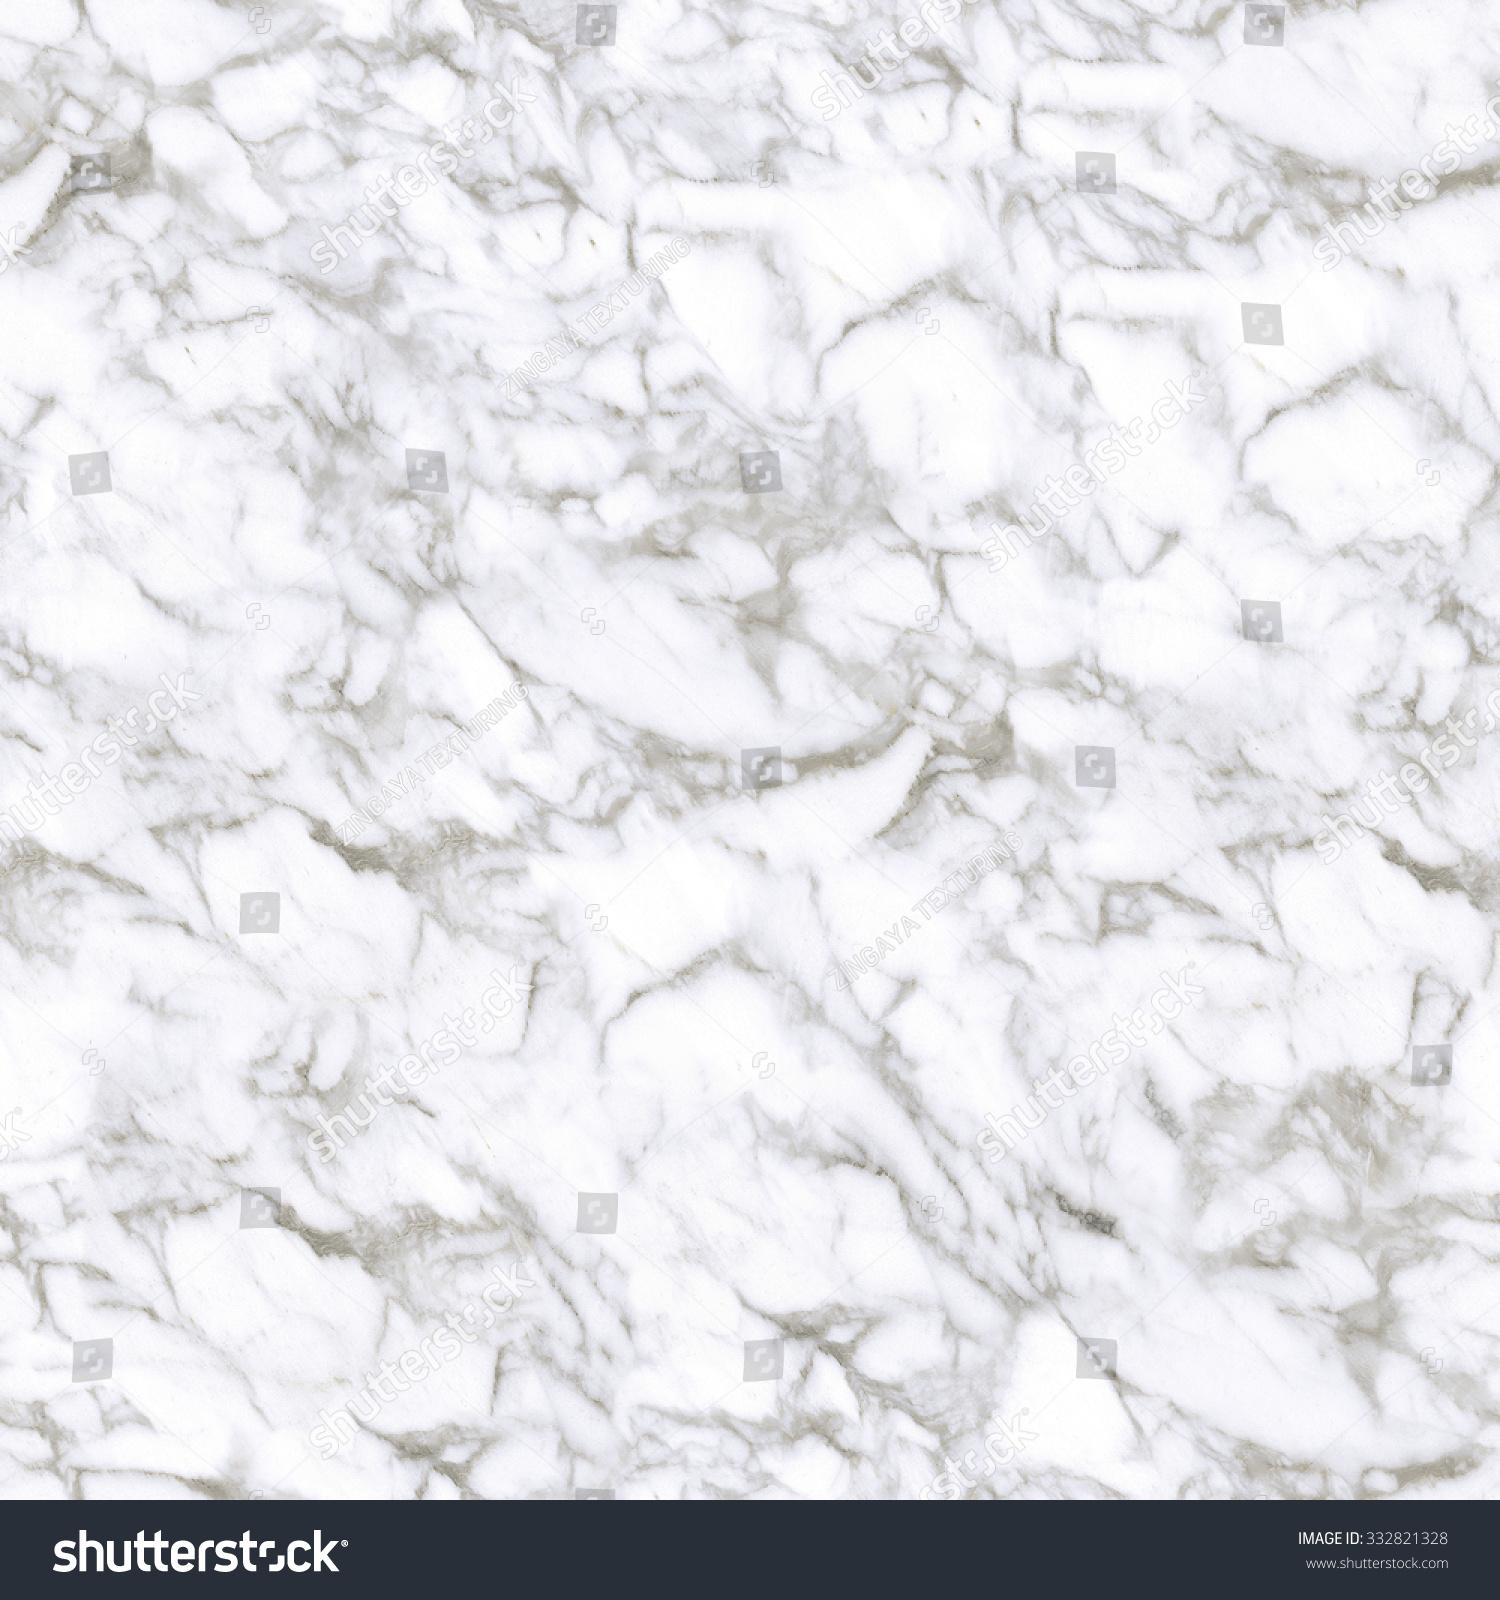 Marble Texture. White Stone Background. Tiled Design. Seamless Pattern